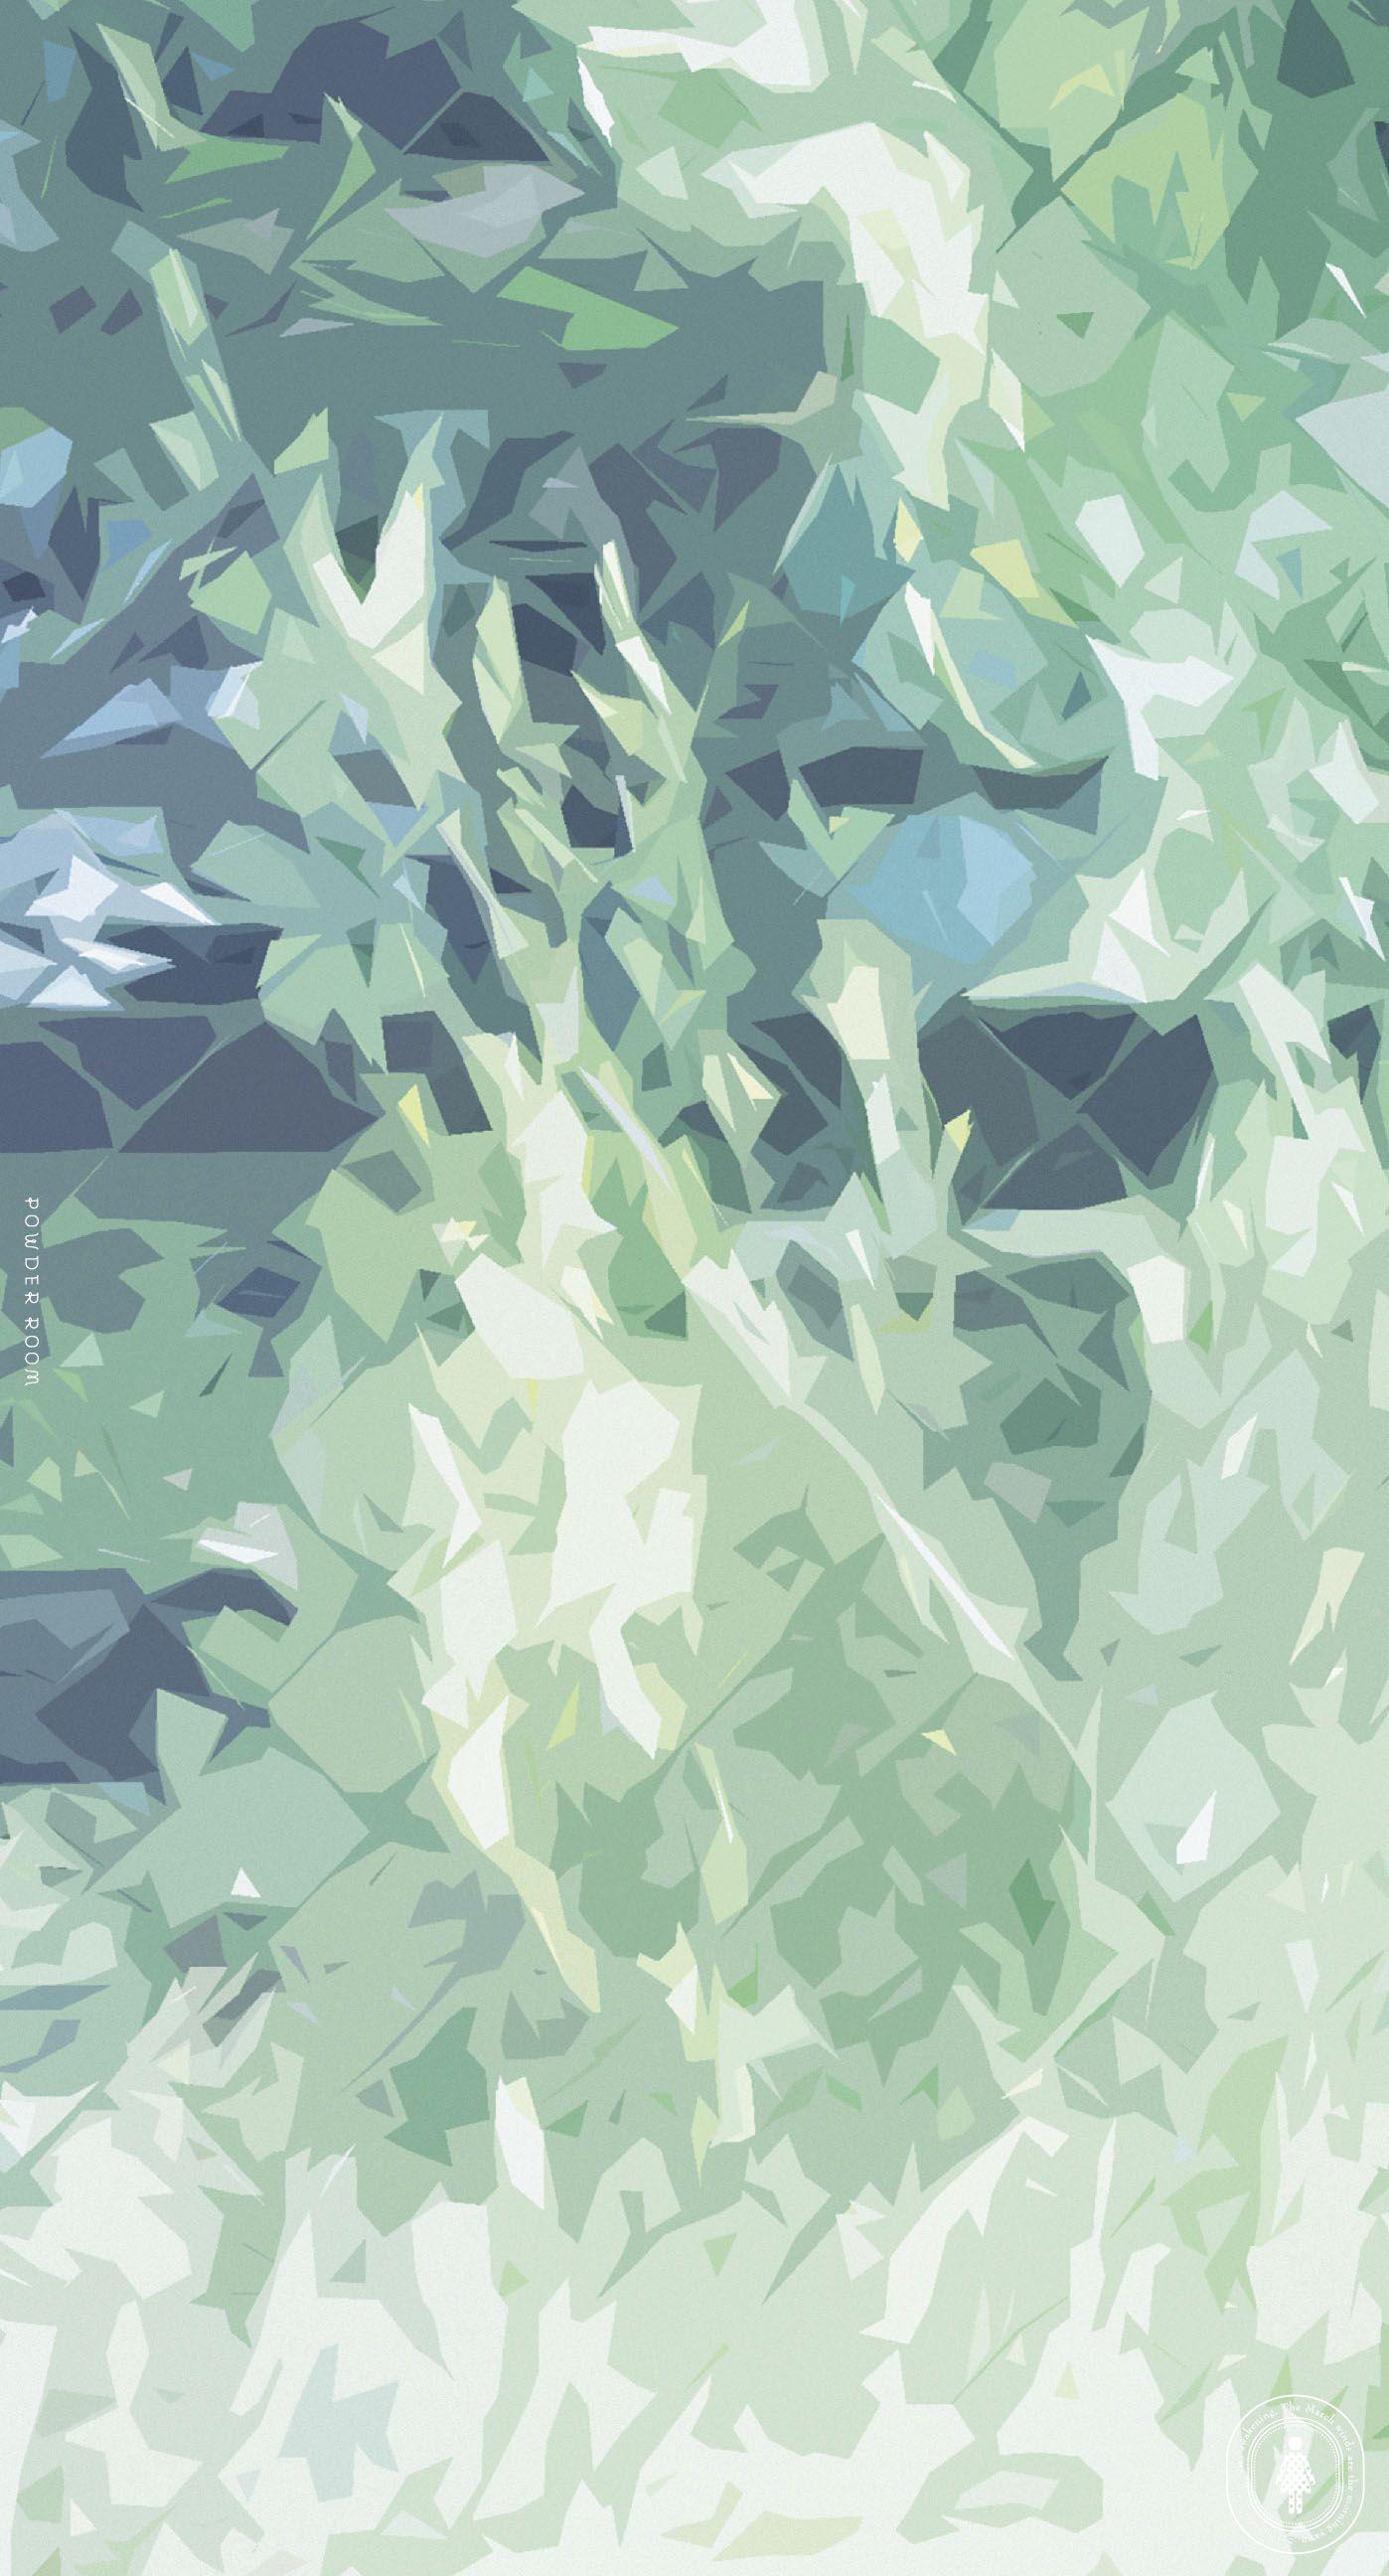 Free Wallpaper Iphone Smartphone Illustration Green スマホ 壁紙